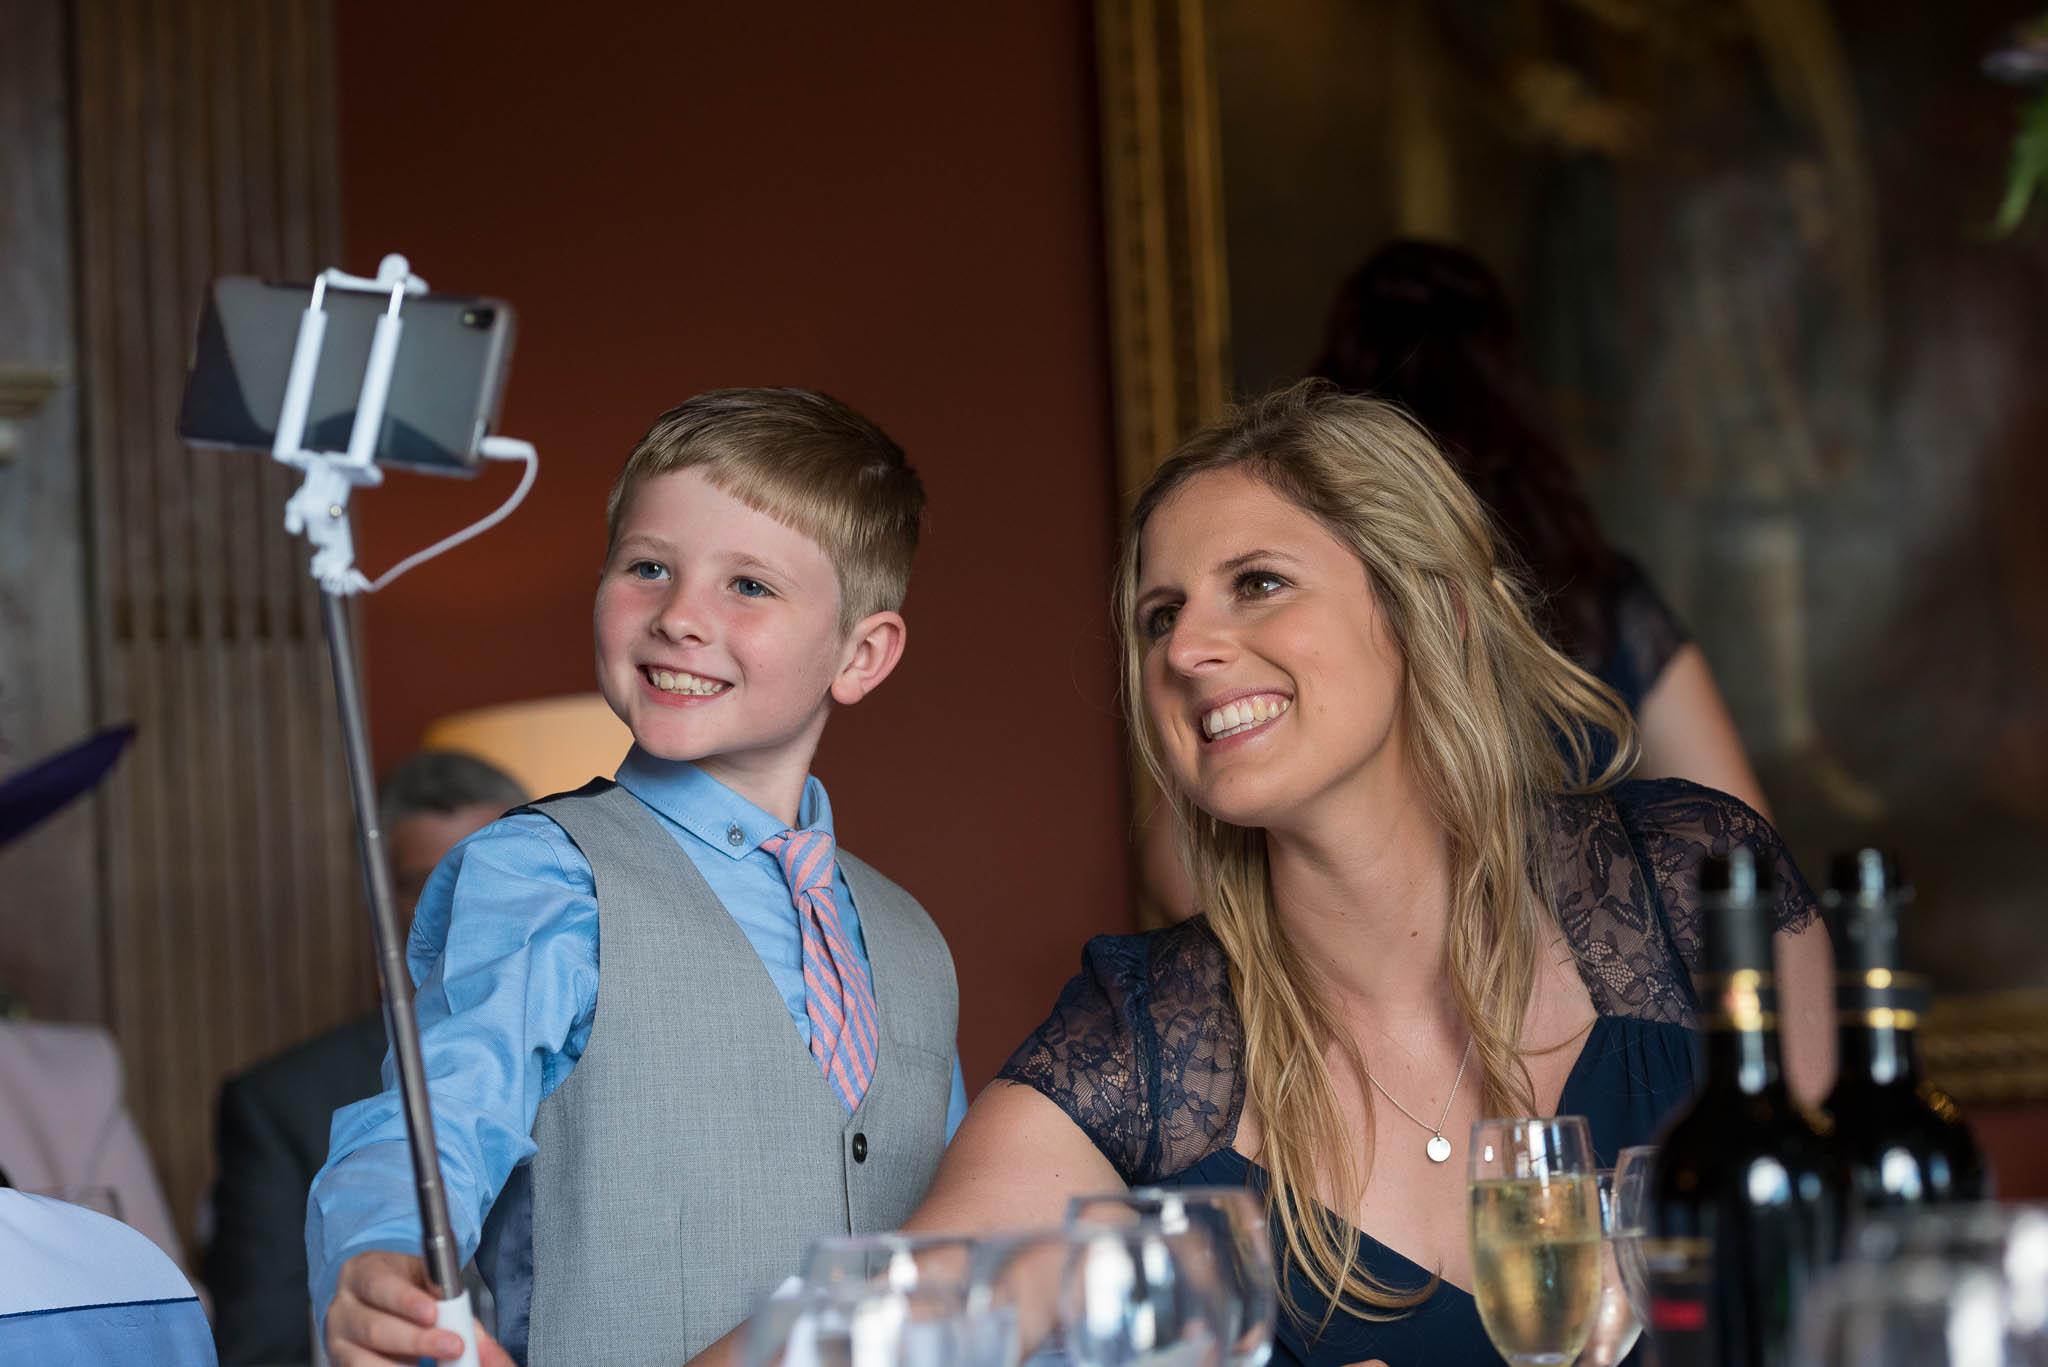 Crathorne Hall Hotel Wedding Photographer75.jpg